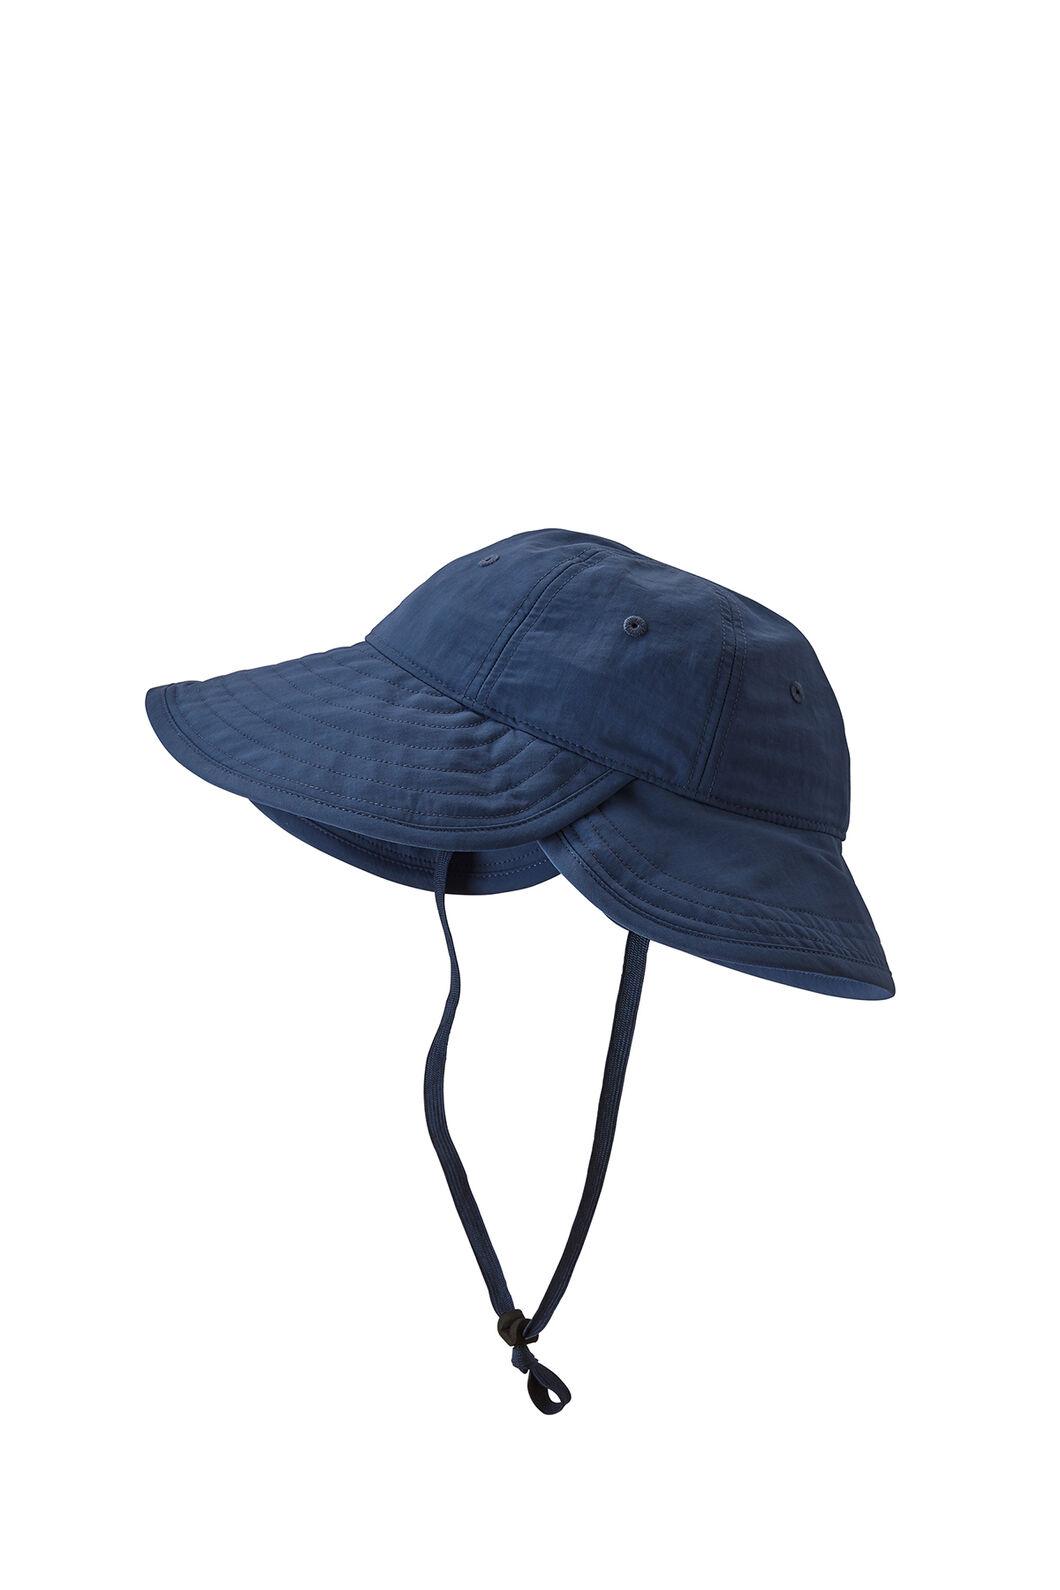 Patagonia Hike Hat — Women's, STONE BLUE, hi-res